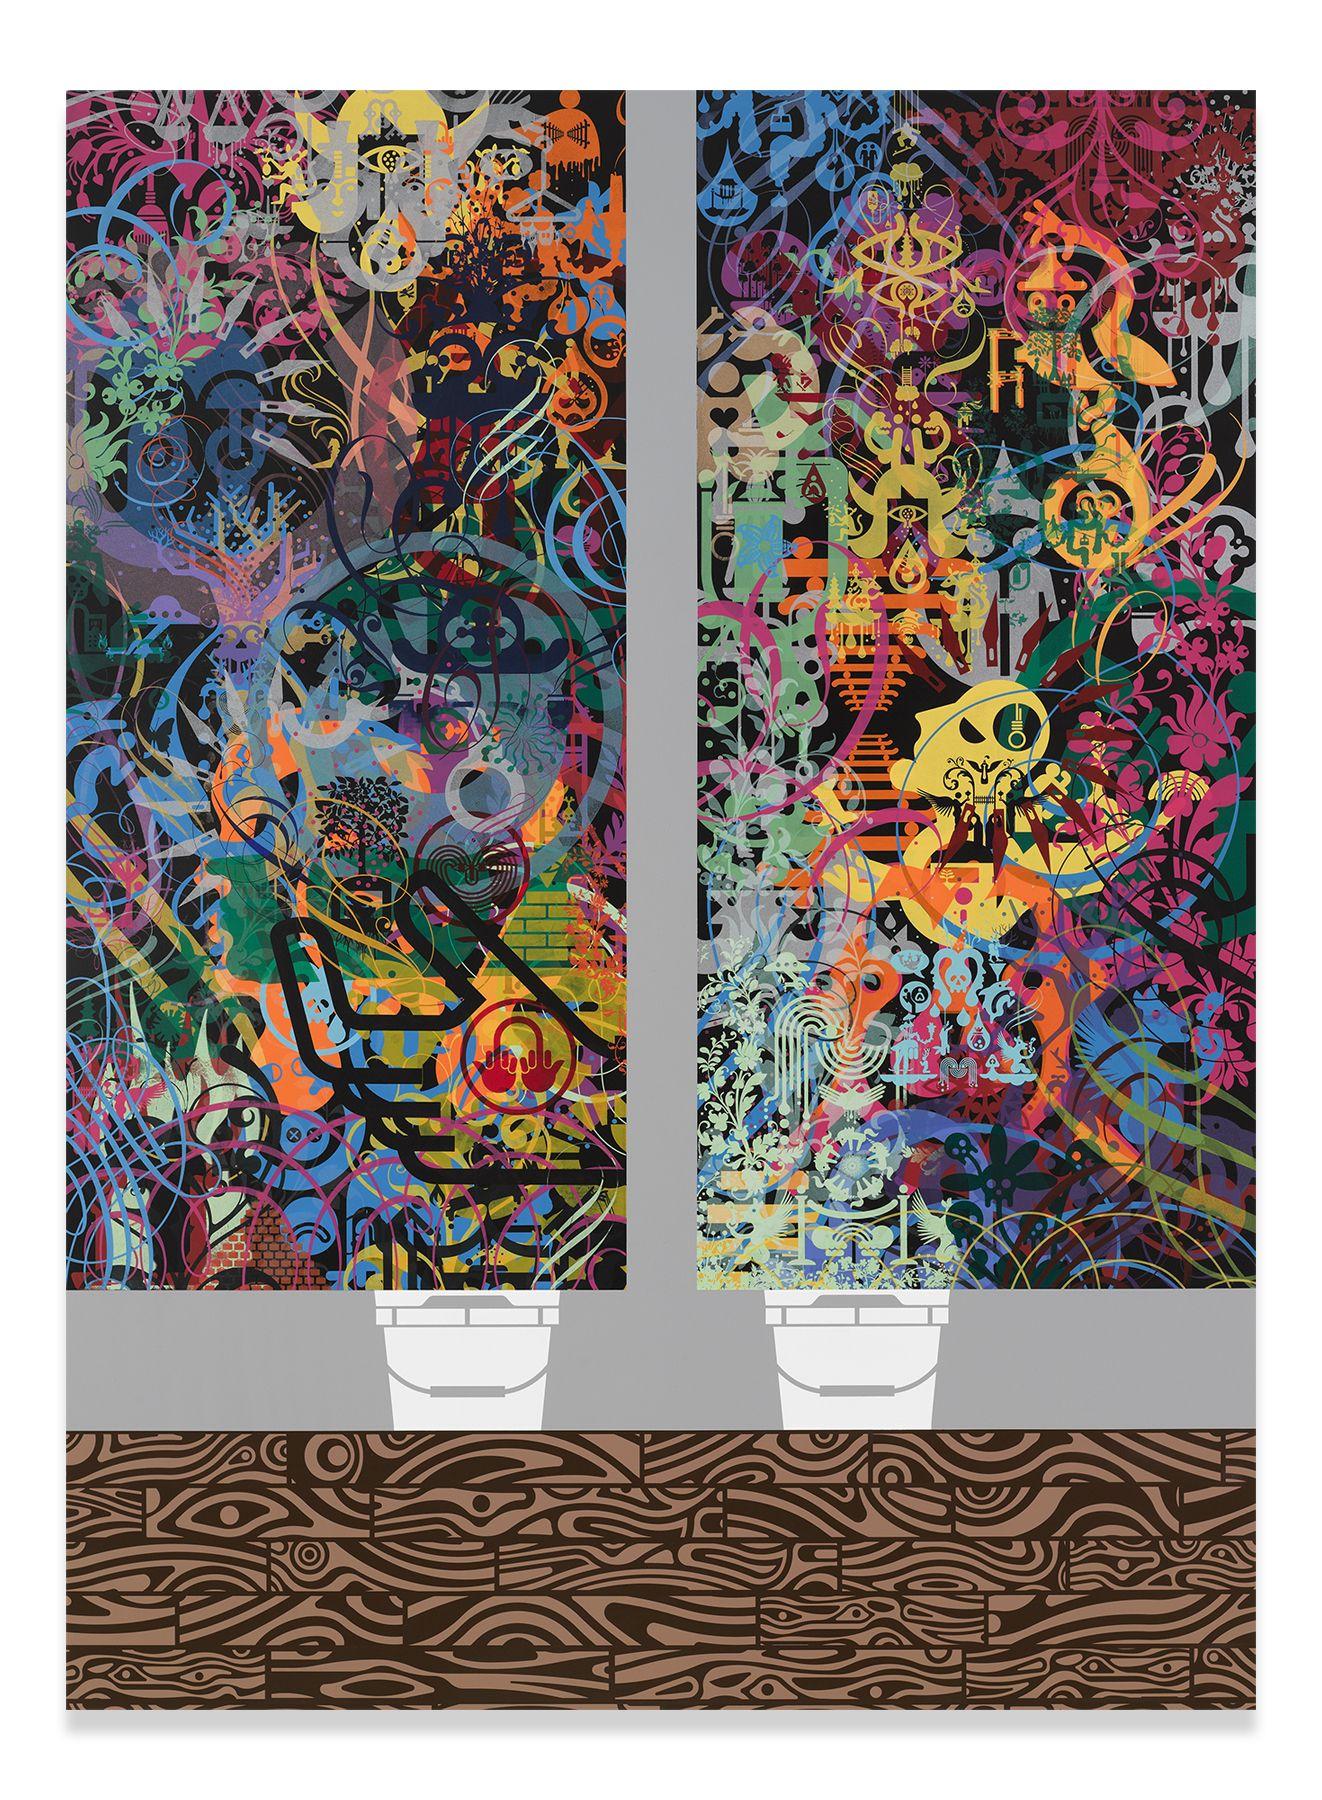 Script Kitties, 2016,Acrylic on wood panel,69.5 x 51.125 inches,176.5 x 129.9 cm,MMG#31347